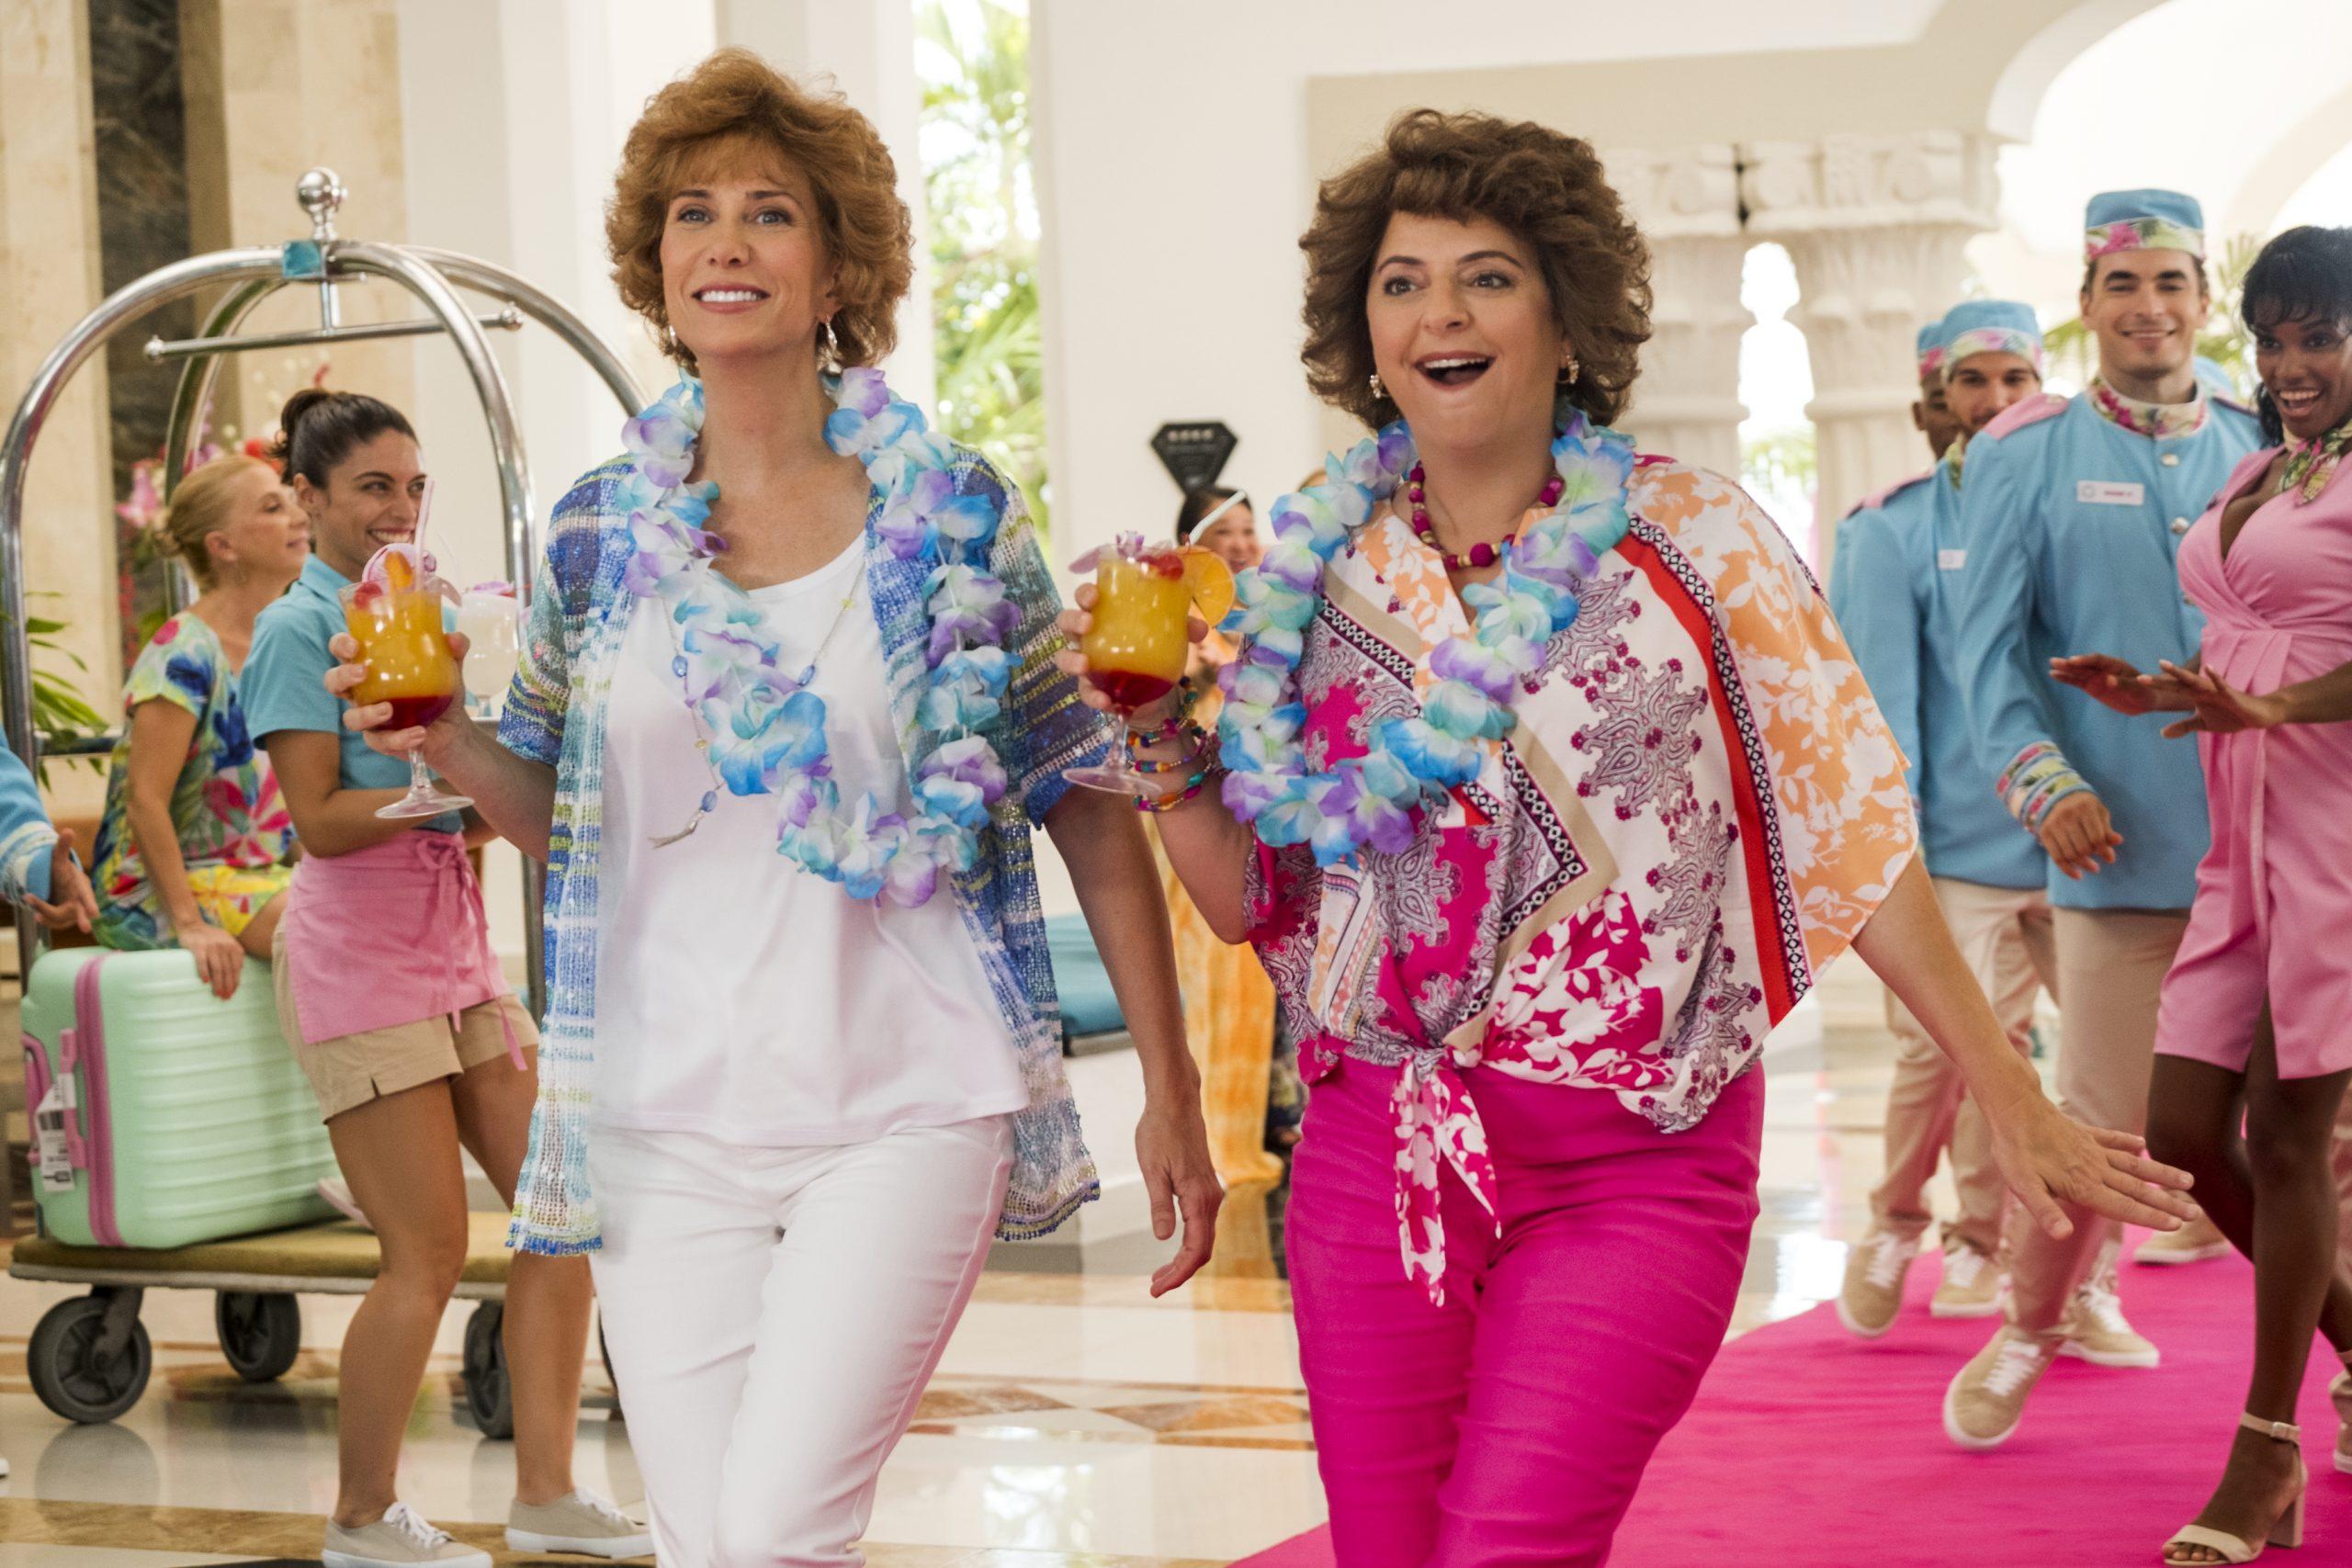 Barb and Star Go to Vista Del Mar Trailer